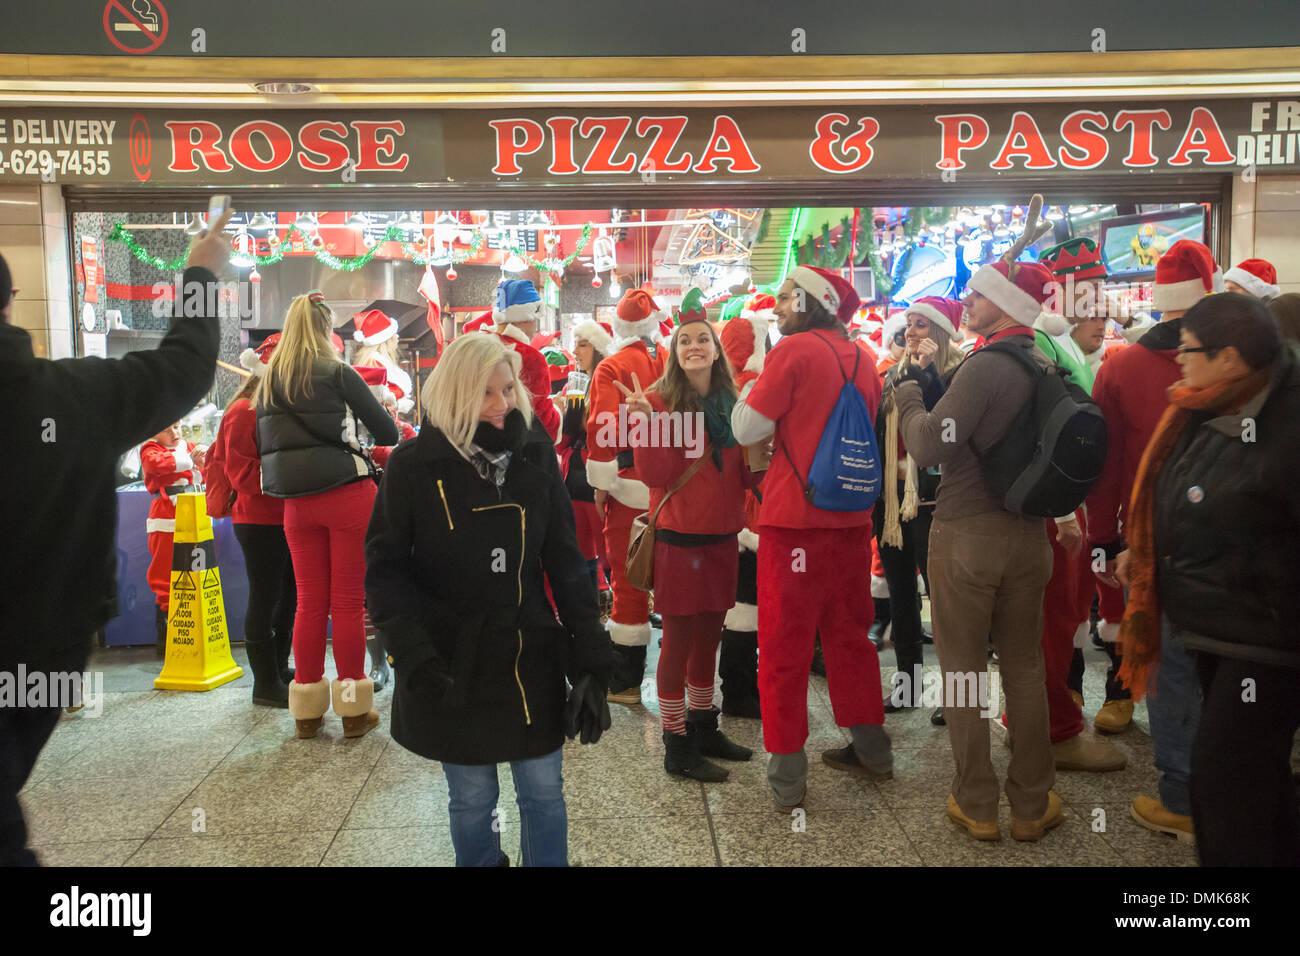 32392114 New York, USA. 14th December 2013. Christmas revelers arrive at  Pennsylvania Station for